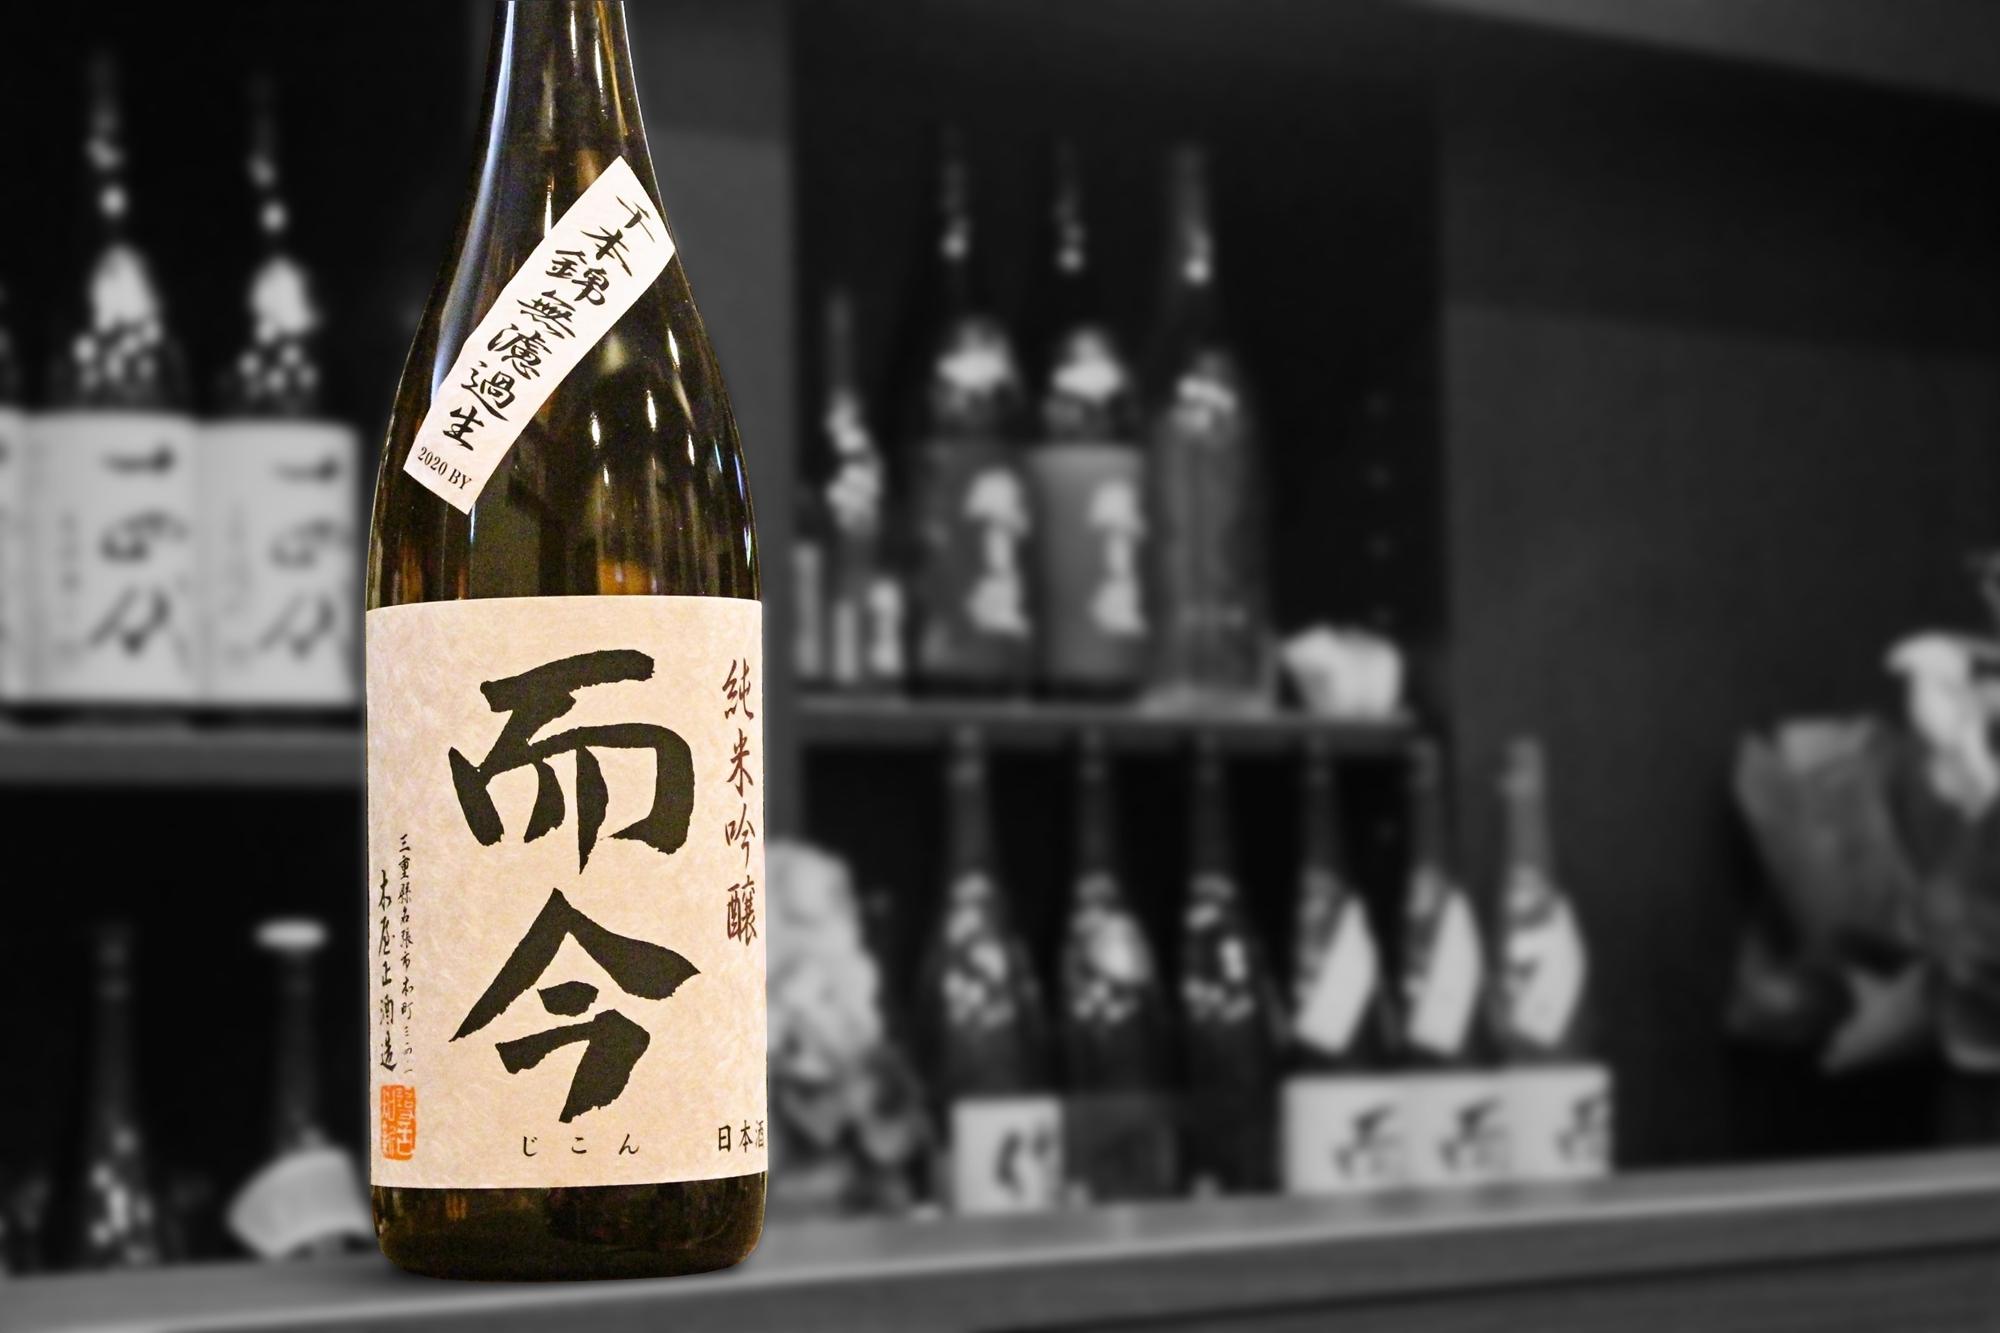 而今純米吟醸千本錦202101-001